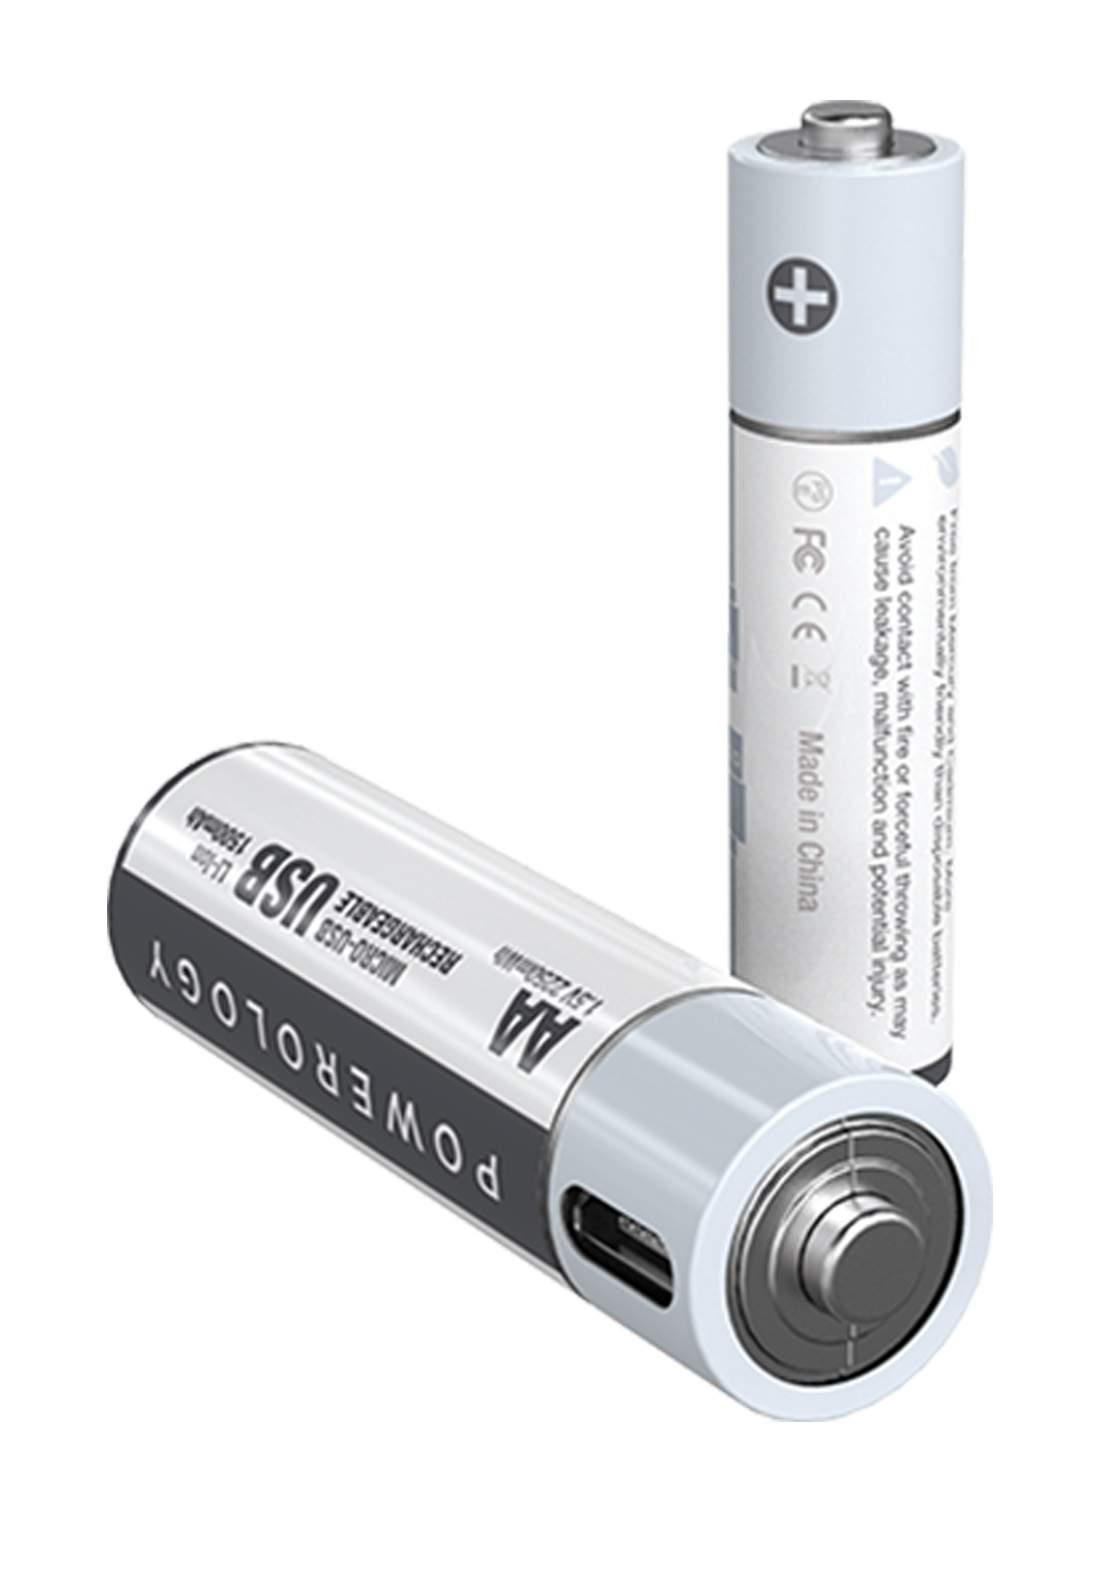 Powerology PRUBAA2 USB Rechargeable Battery-AA 2pcs بطاريات